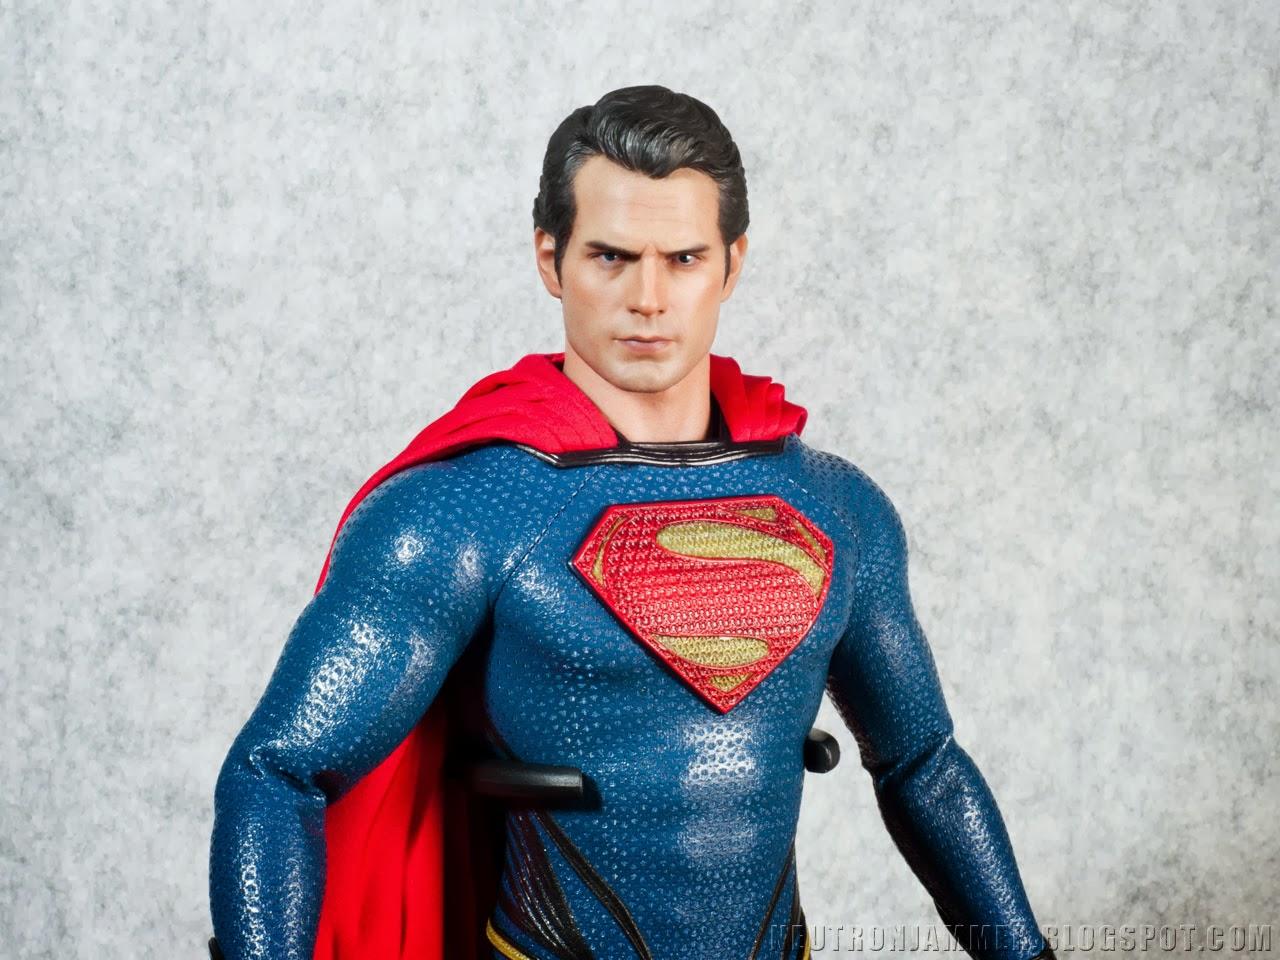 Neutron Jammer: Hot Toys: Man Of Steel - Superman Movie Masterpiece Review